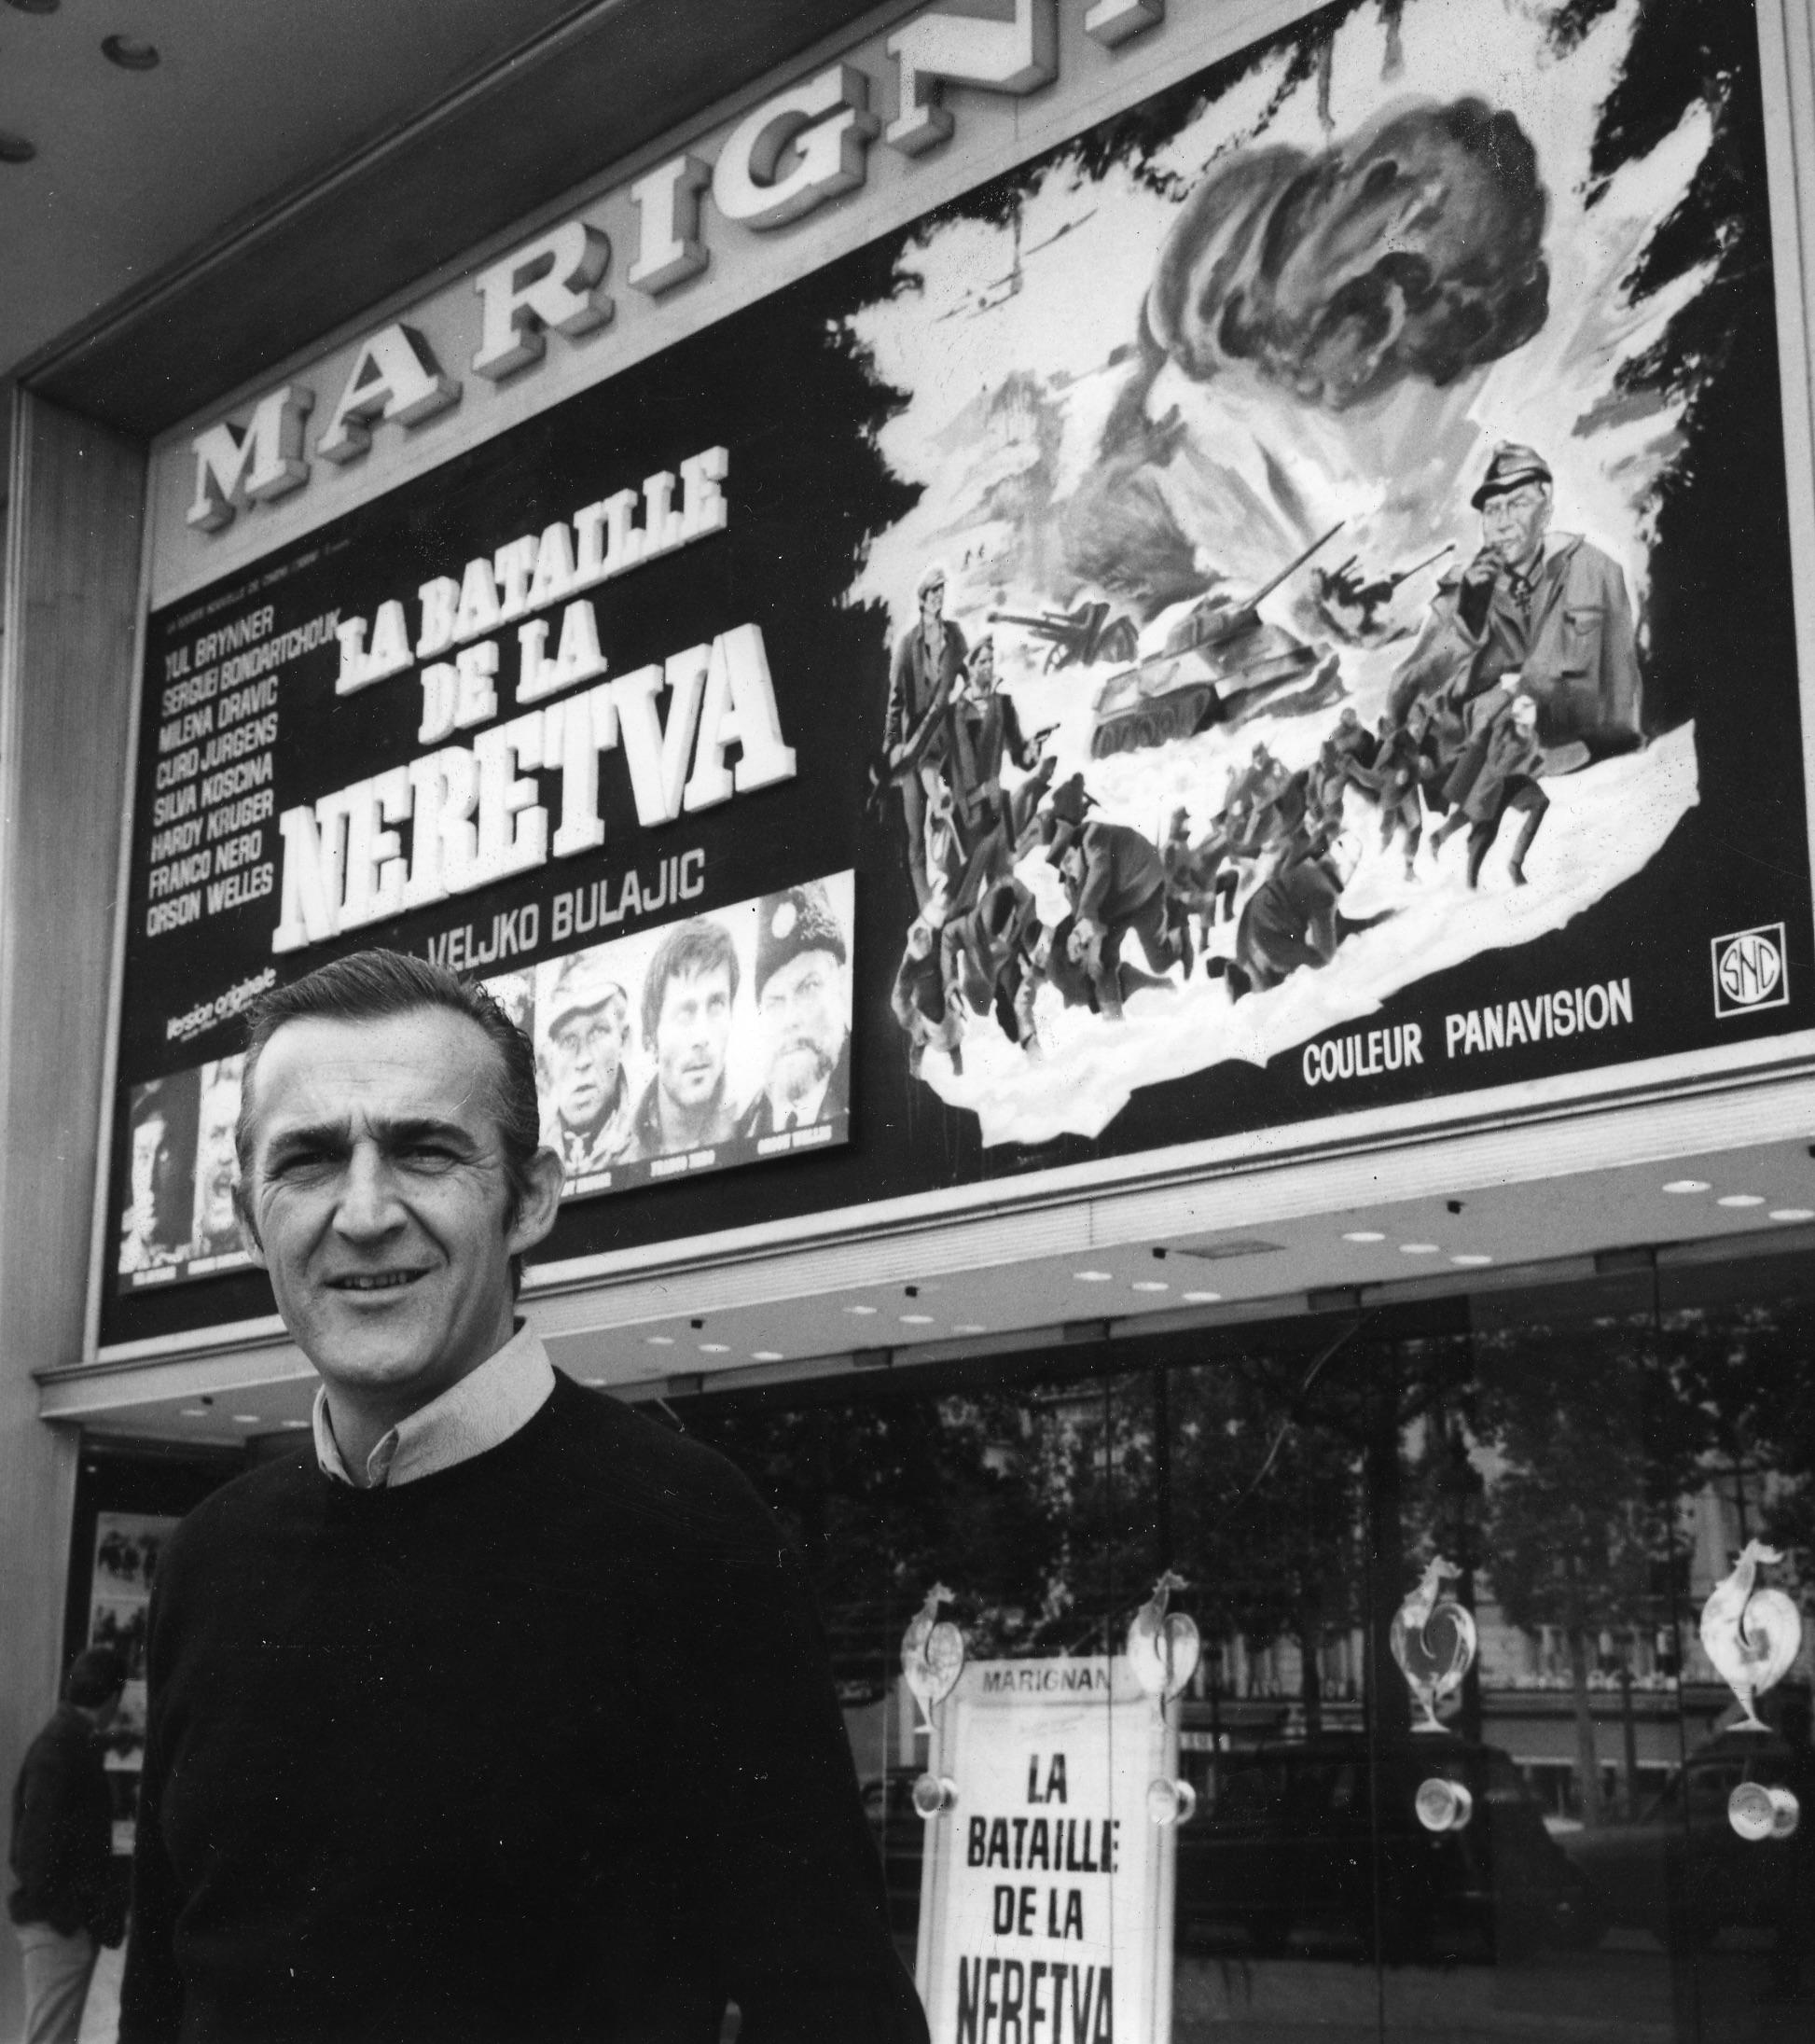 Veljko Bulajic at an event for Bitka na Neretvi (1969)